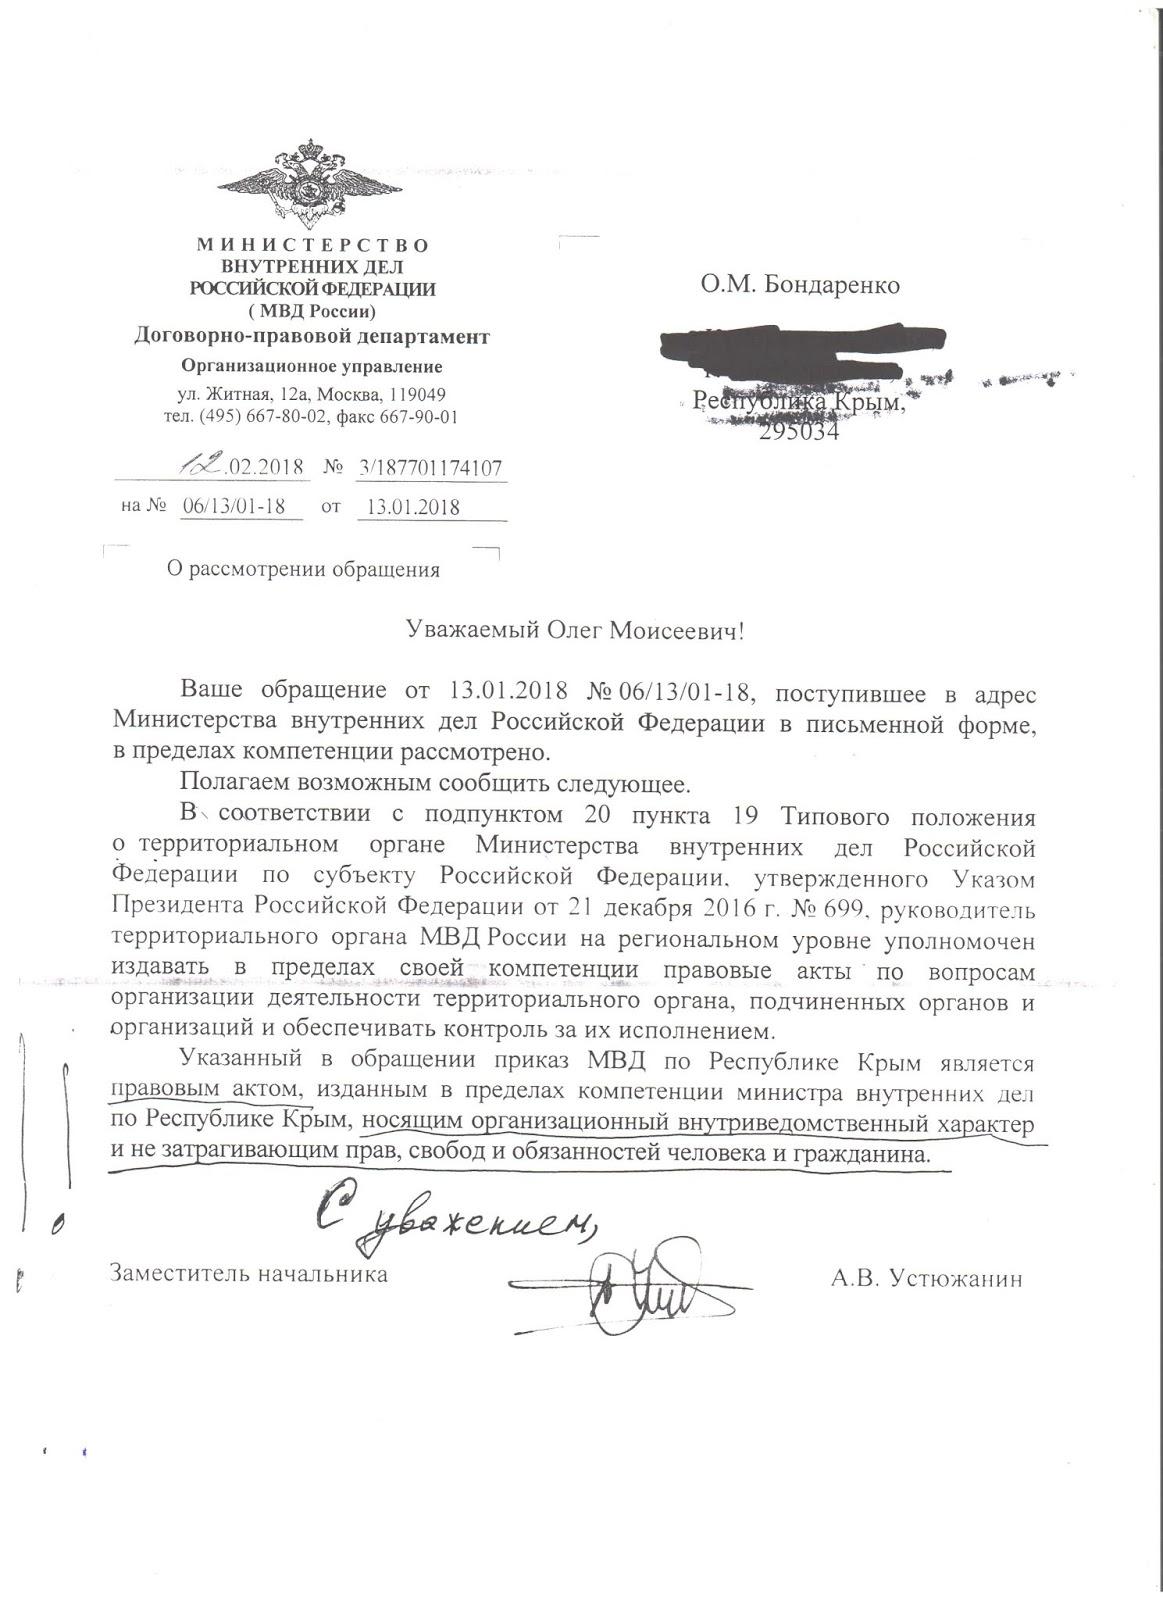 Приказ мвд россии 88 дсп от 06 02 2012